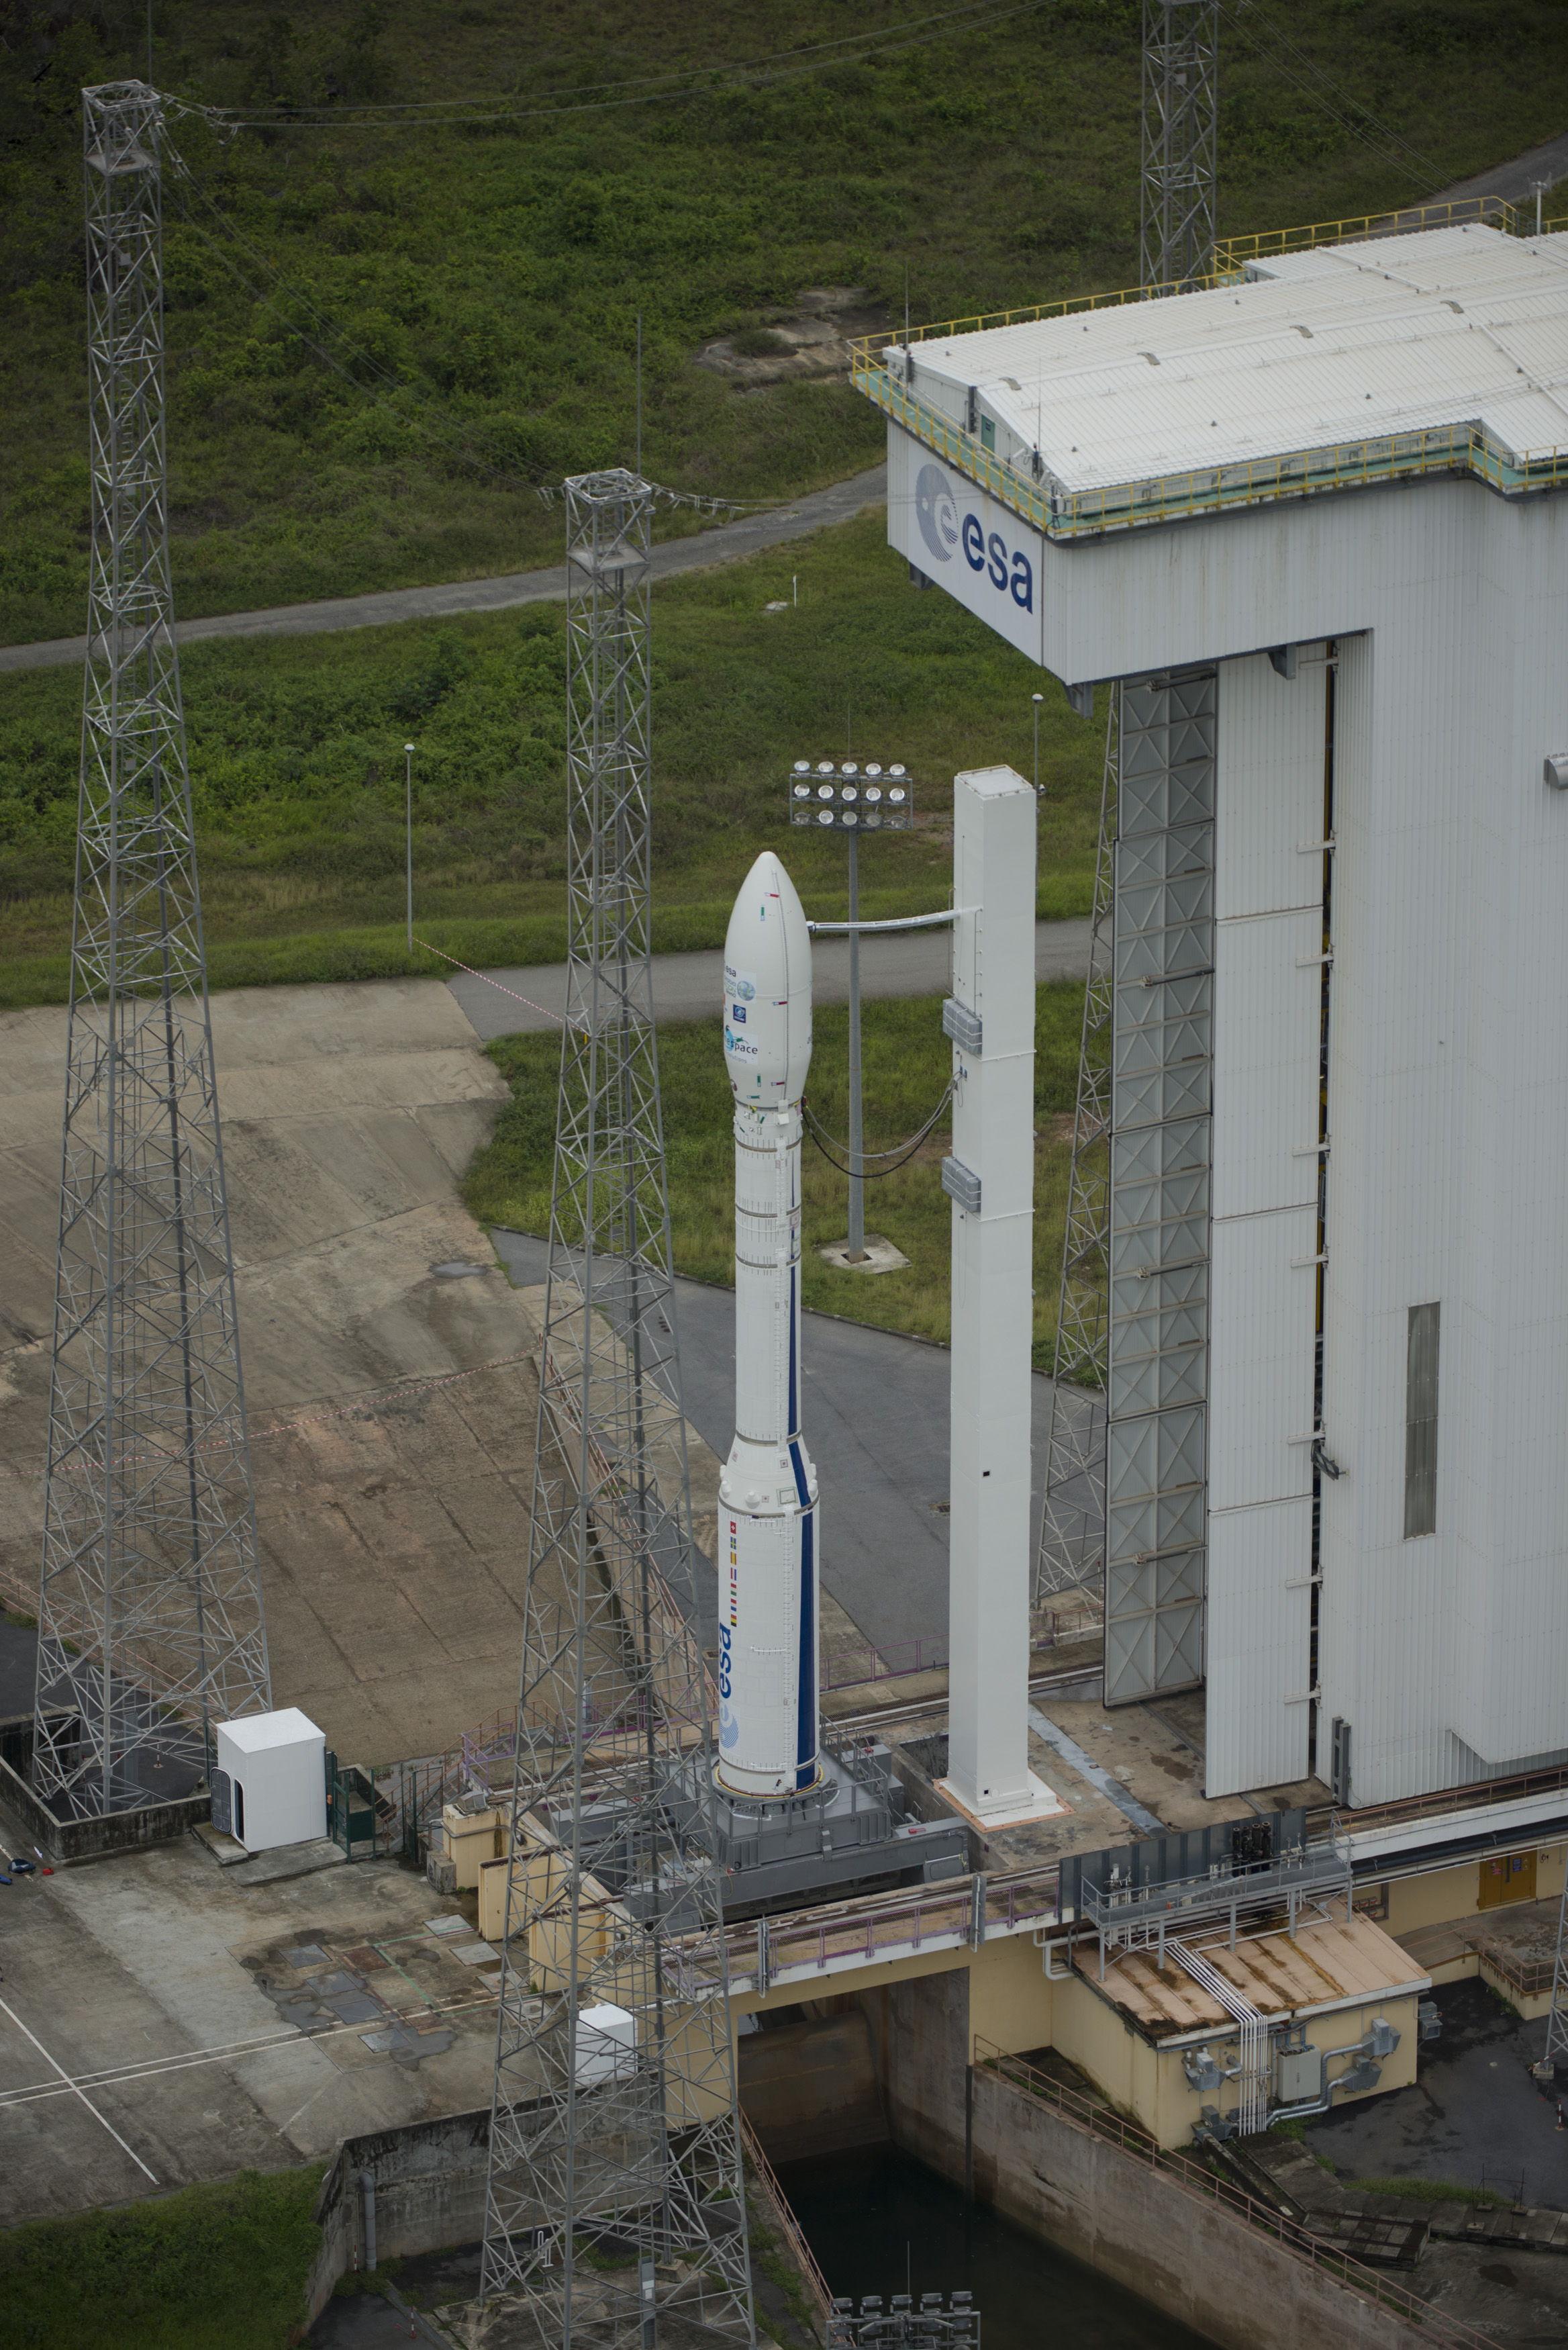 Fully Assembled Vega VV02 Rocket on Pad High Angle